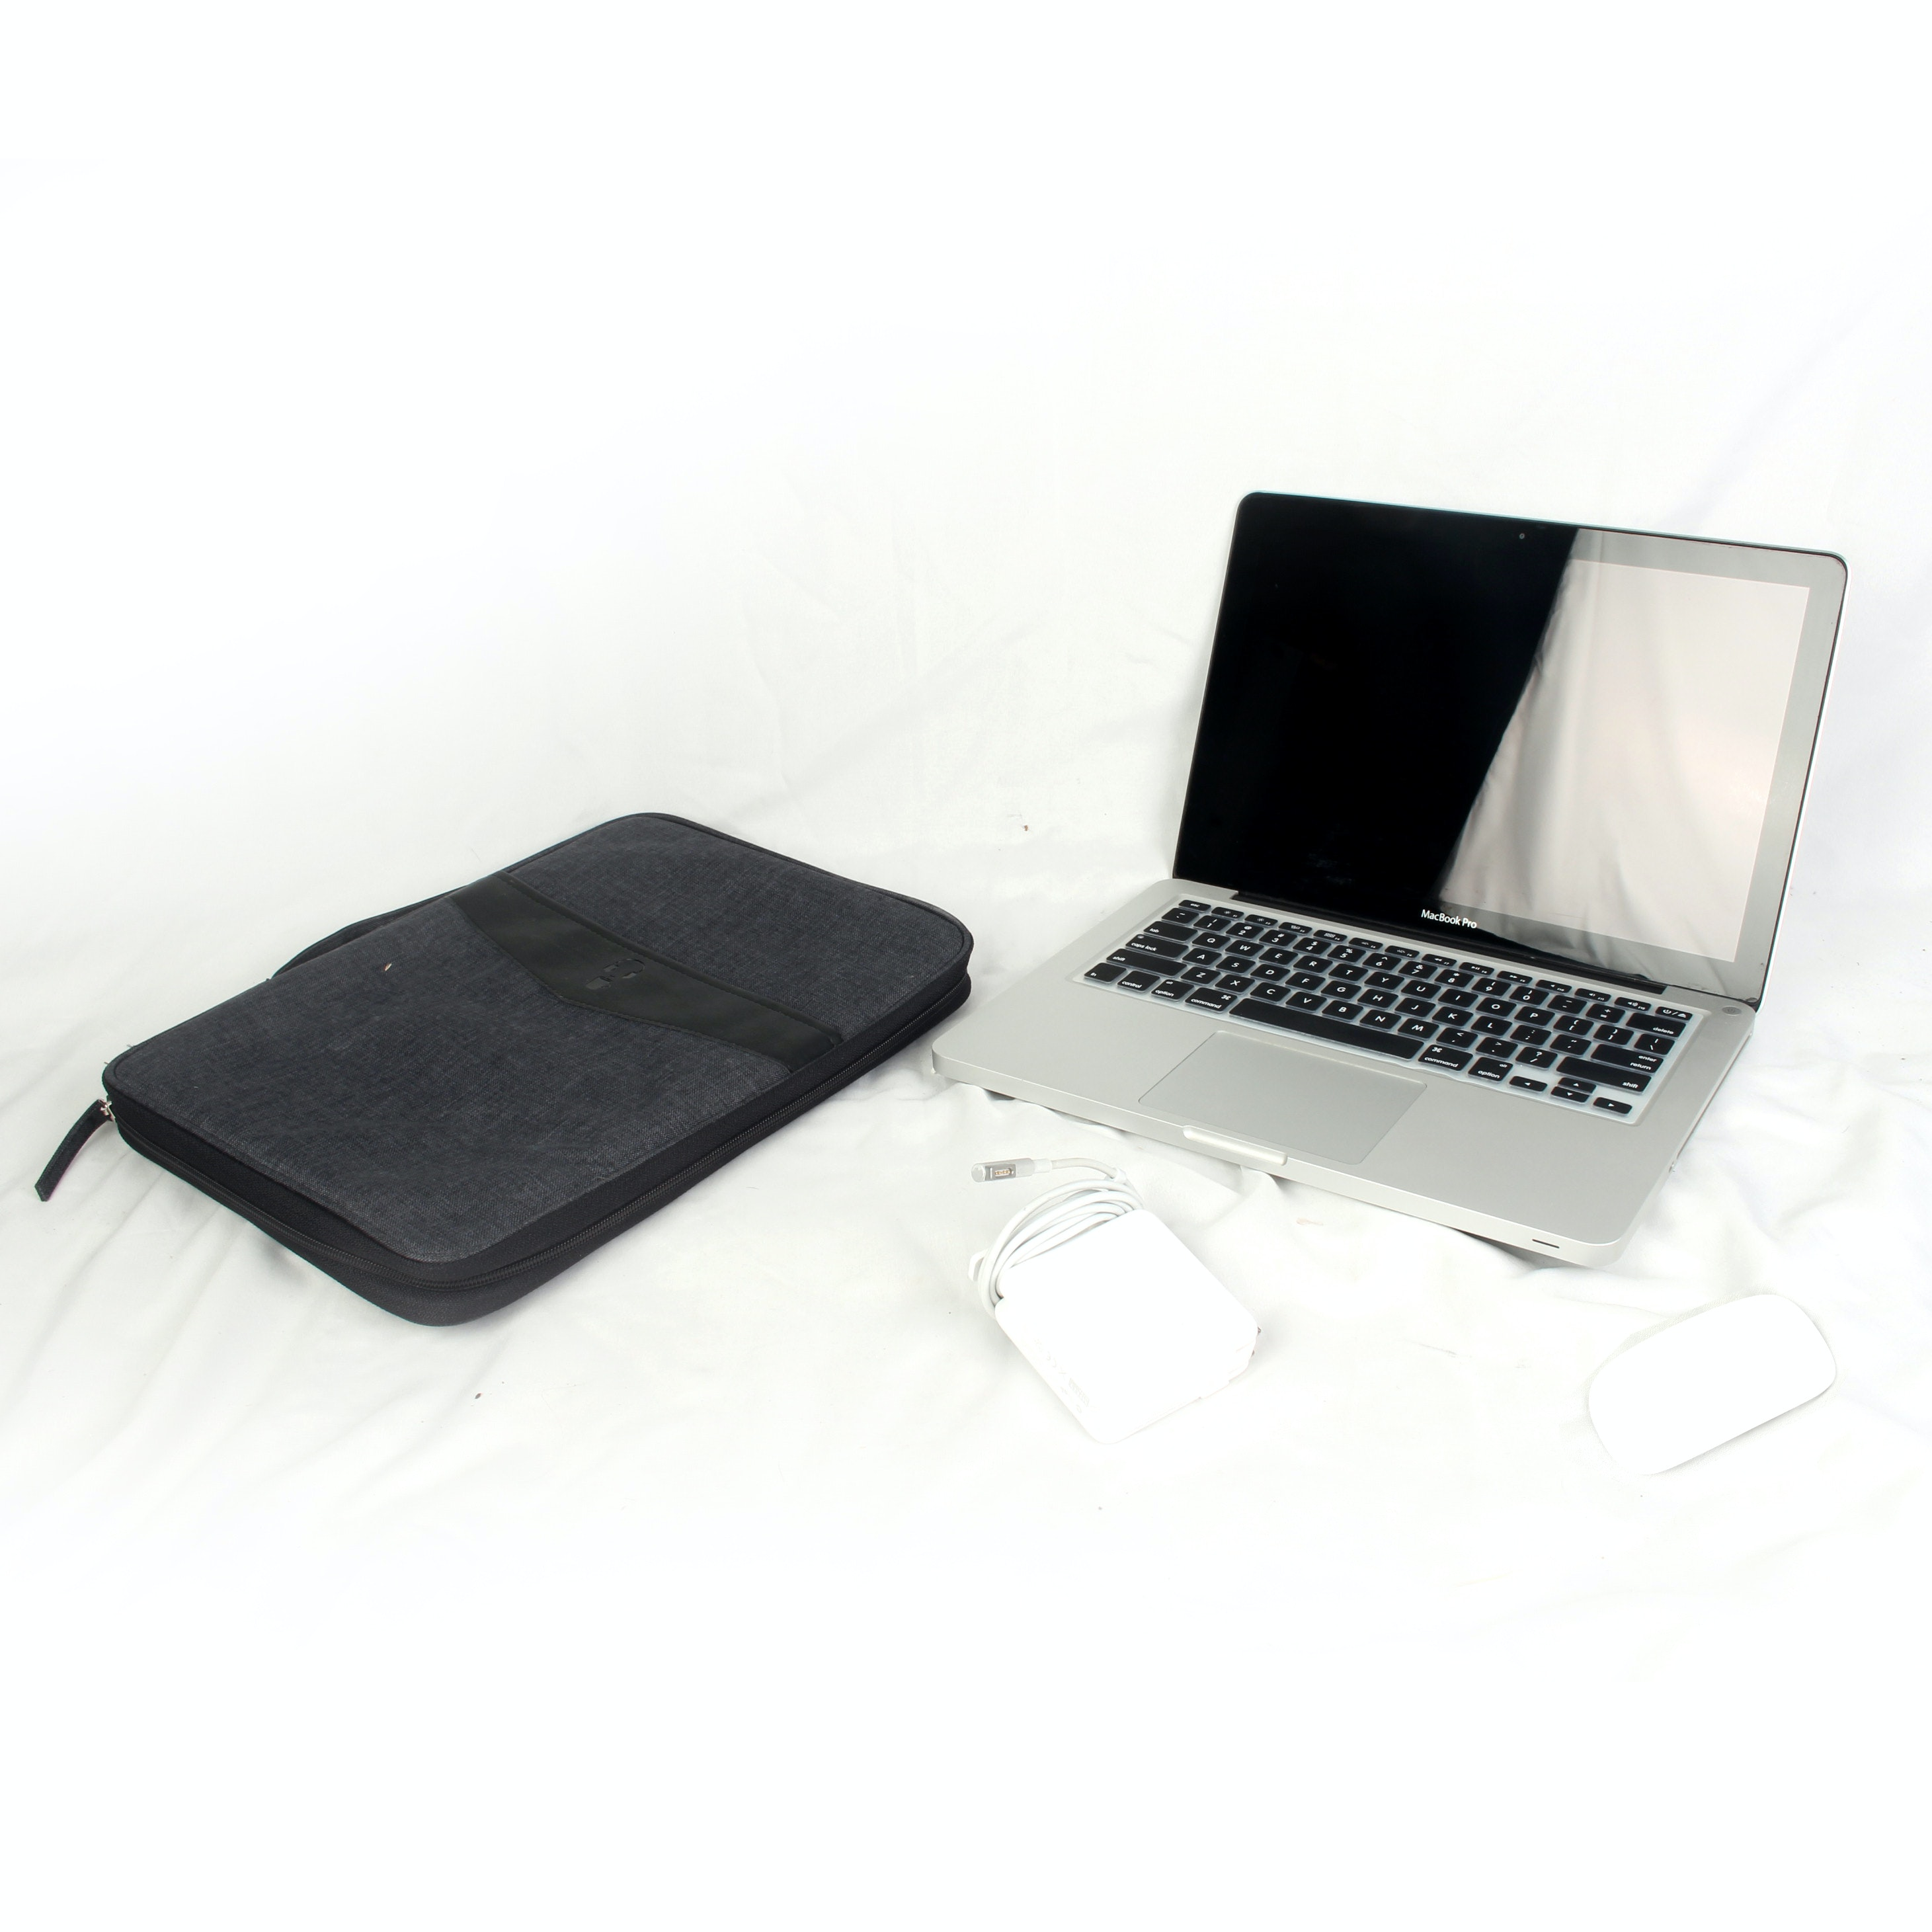 MacBook Pro Laptop, Apple Mouse and Laptop Case